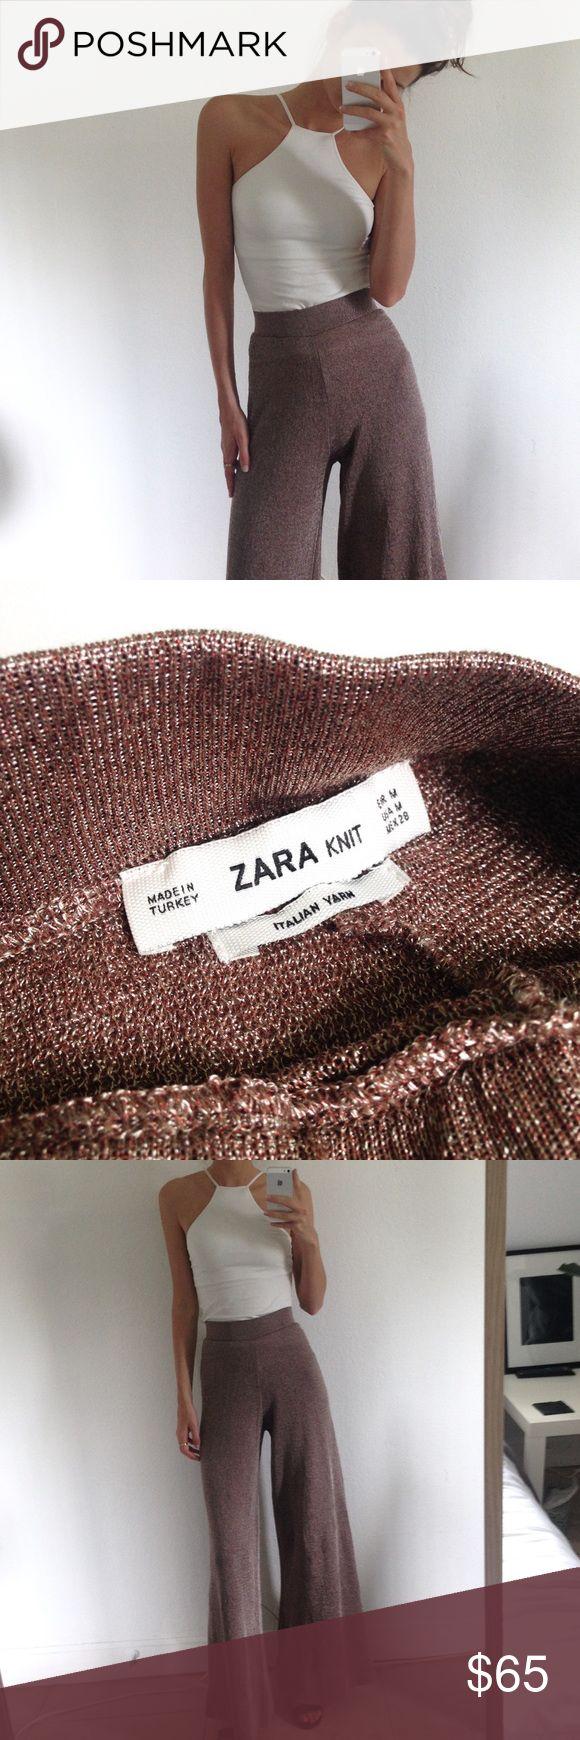 Zara / Knit Wide Leg Trousers Adorable Zara Knitted Wide leg nude trousers, size M. Extra long fit. Semi metallic Italian yarn. Perfect condition. RARE. Zara Pants Wide Leg